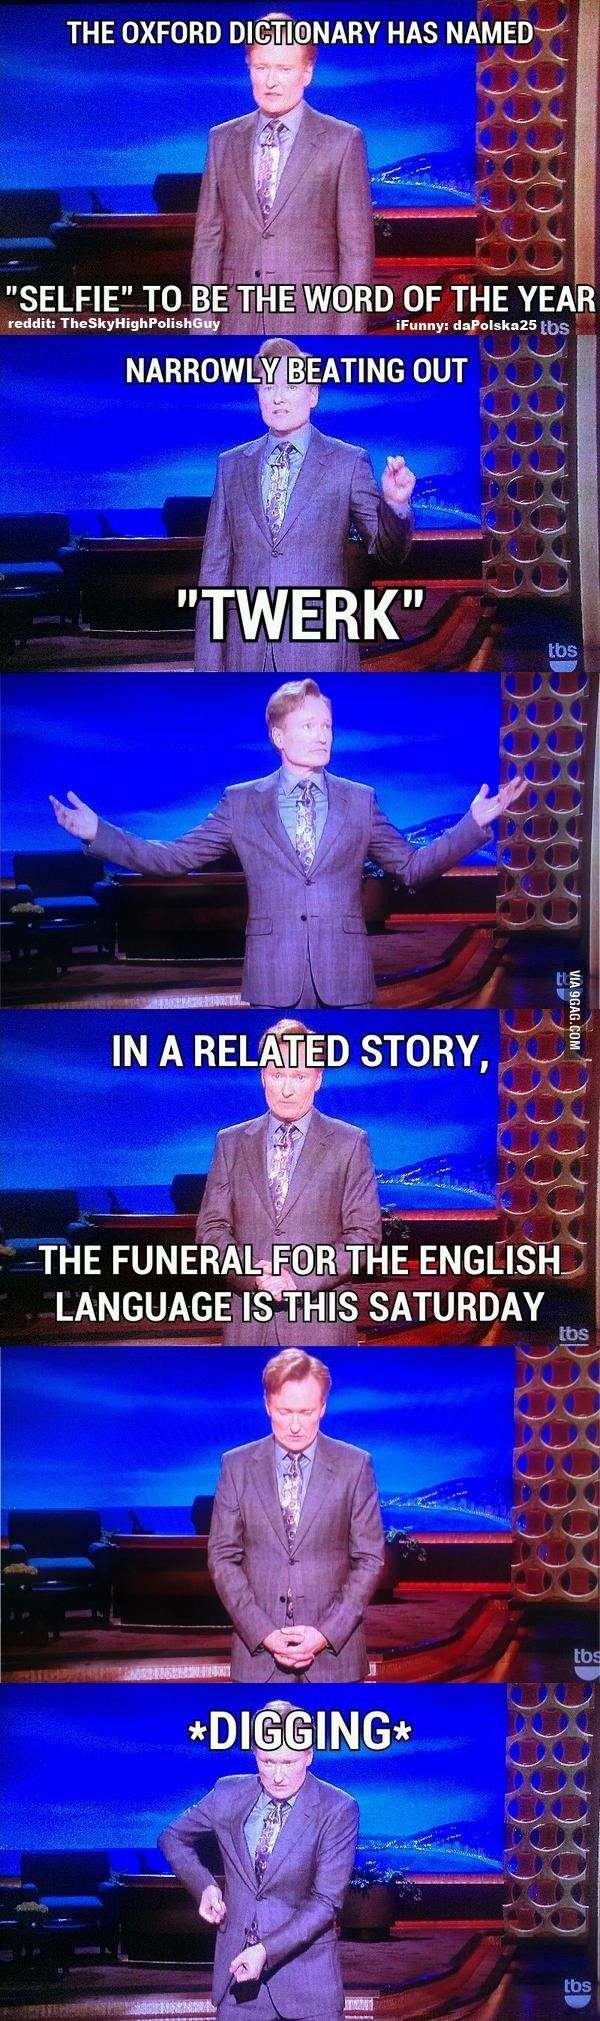 The death of the English language - Conan O'Brien